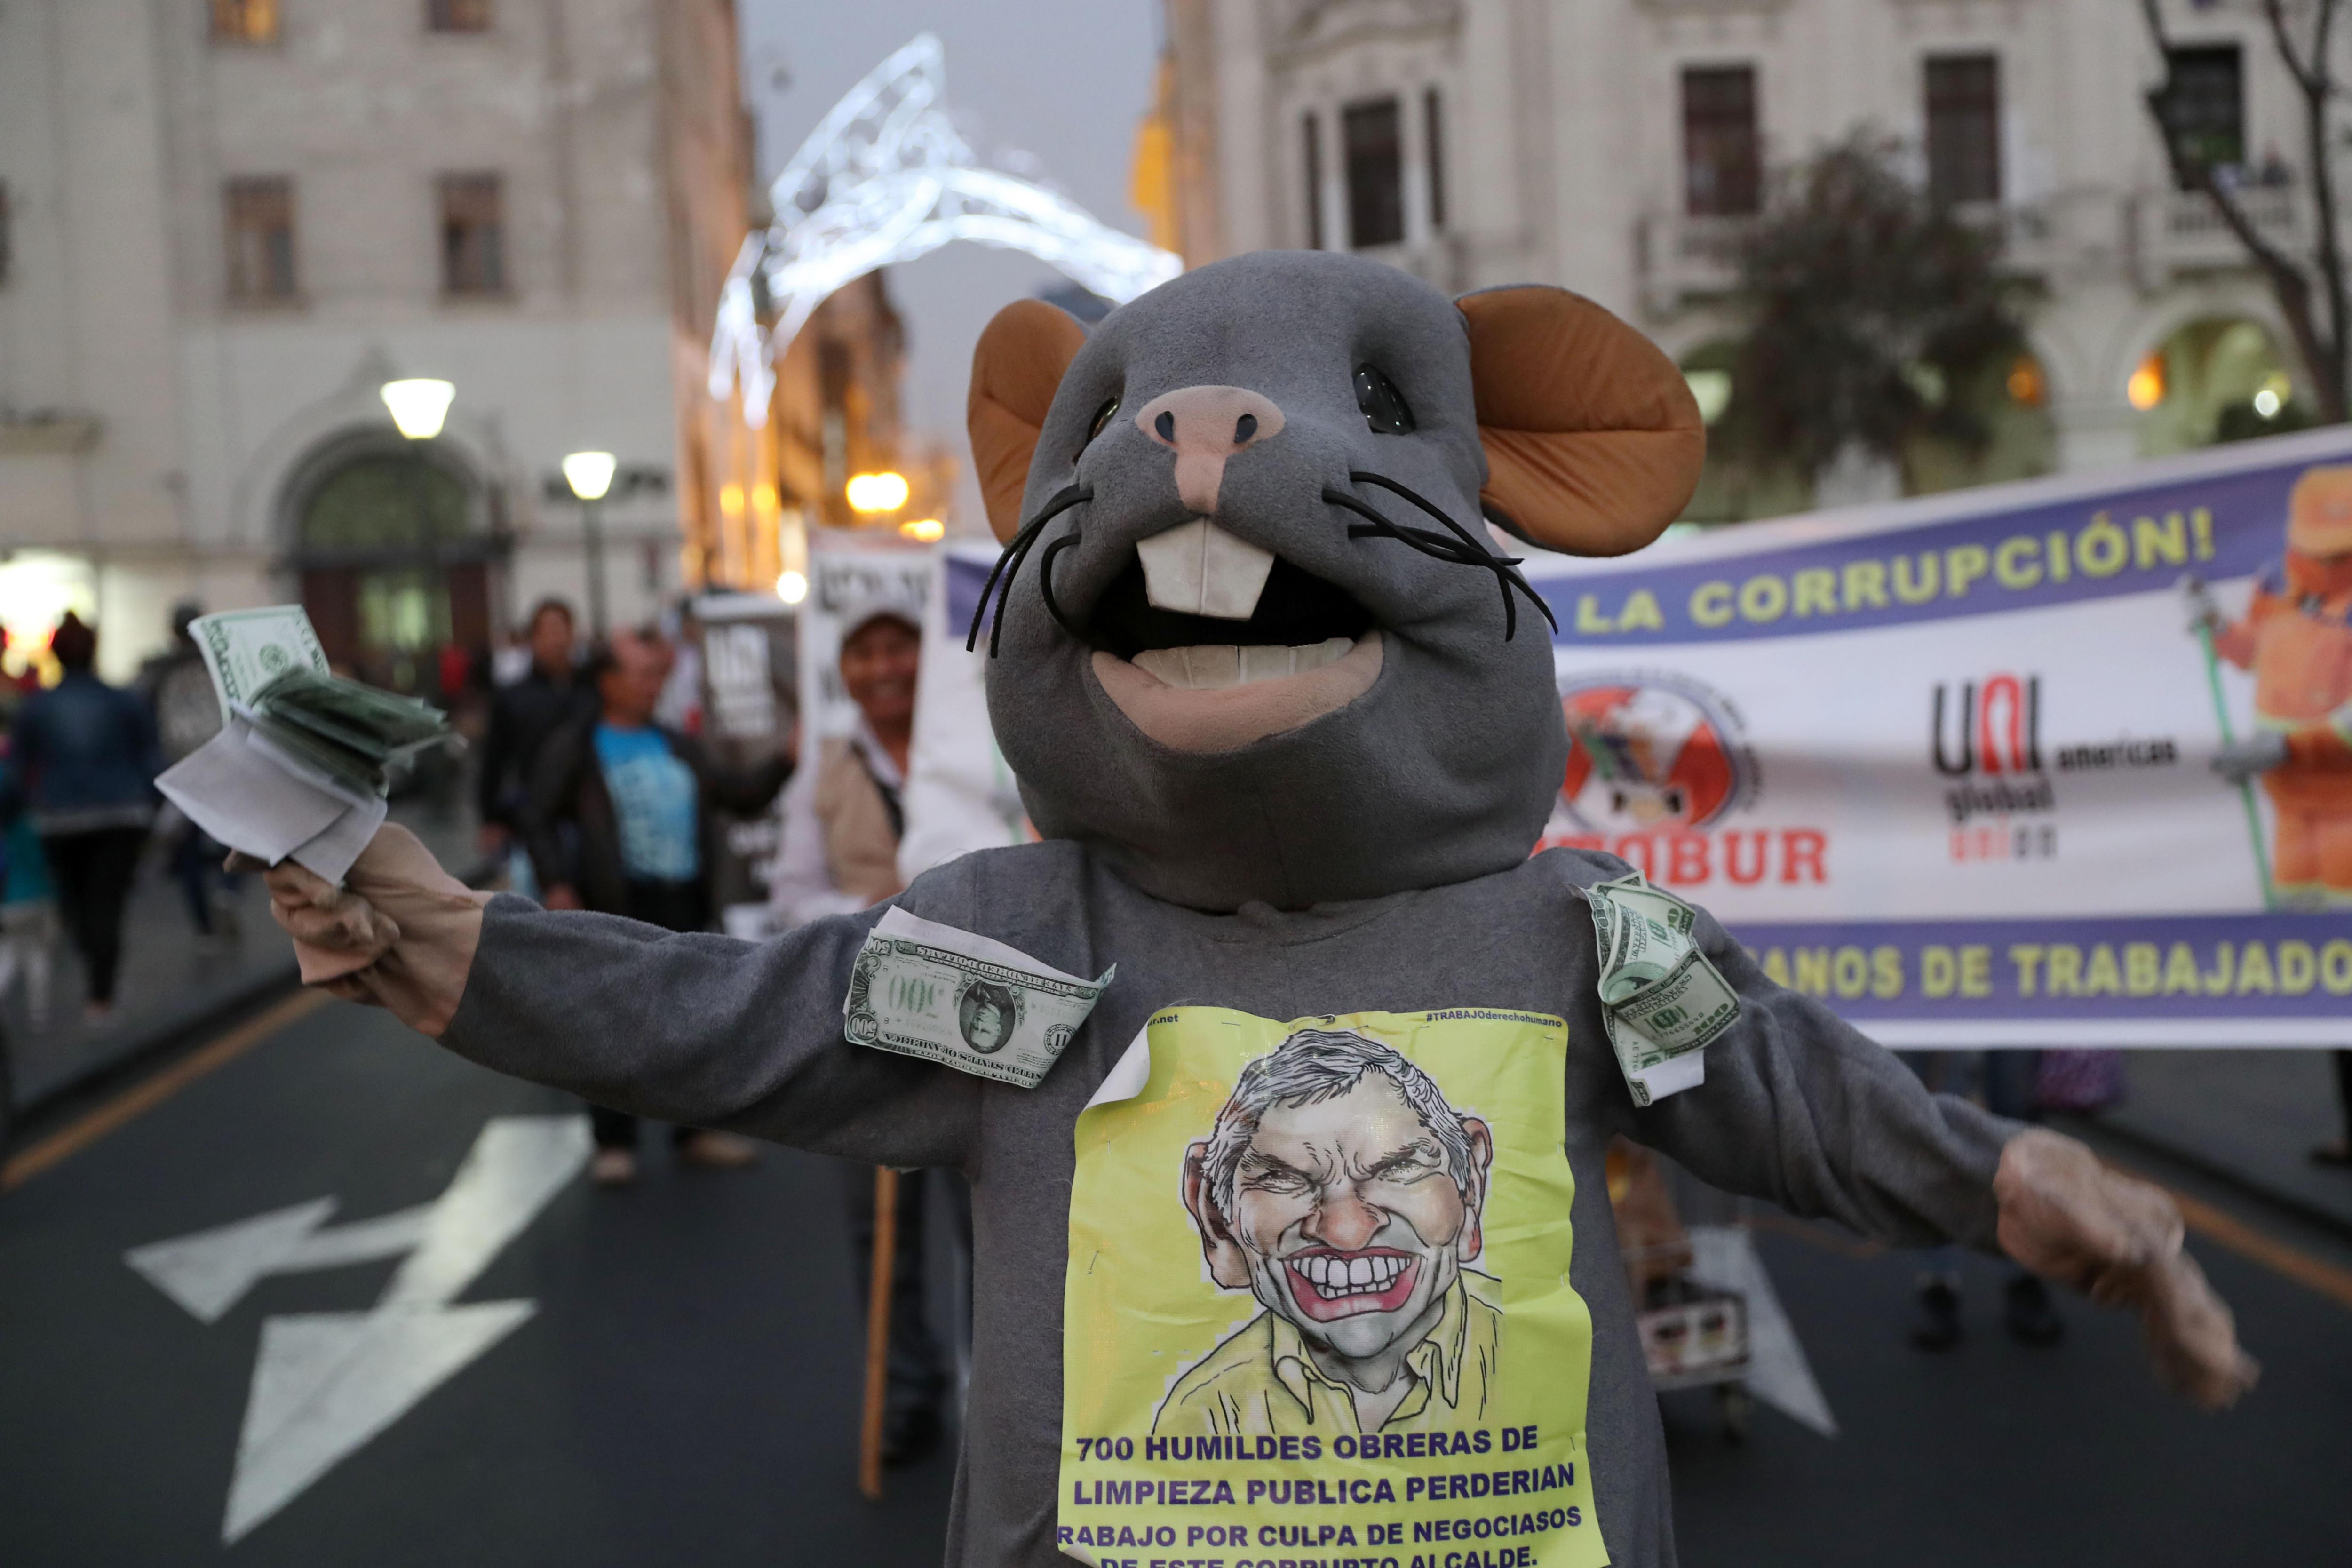 Centenars de peruans marxen contra la corrupció i en defensa de la democràcia. /ERNESTO ARIAS